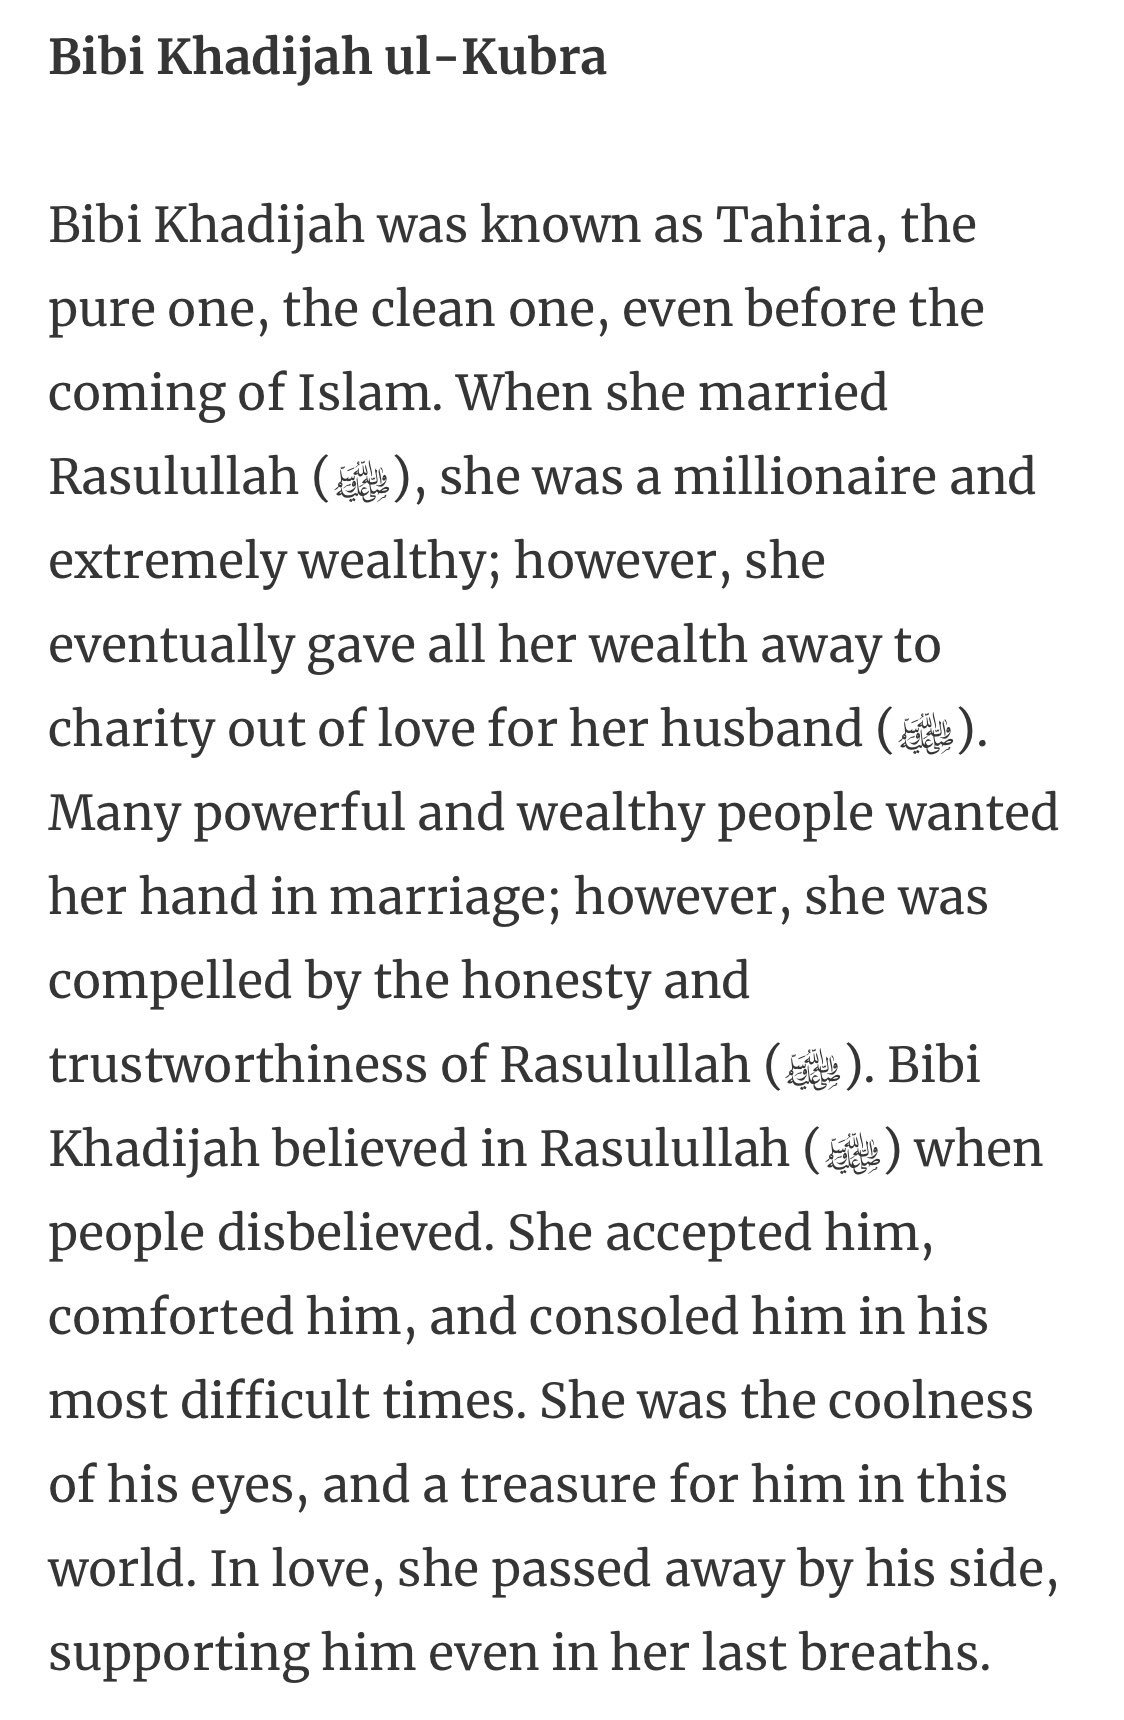 @JeremyMcLellan The 4 Queens of Heaven:   1) Bibi Khadijah, wife of Prophet Muhammad (peace be upon him)   2) Bibi Fatimah, daughter of Prophet Muhammad (peace be upon him)  3) Bibi Maryam (Mary), mother of Prophet Isa (Jesus Christ)   4) Bibi Aasiyah, wife of the Pharaoh https://t.co/tdOw4o9aFm